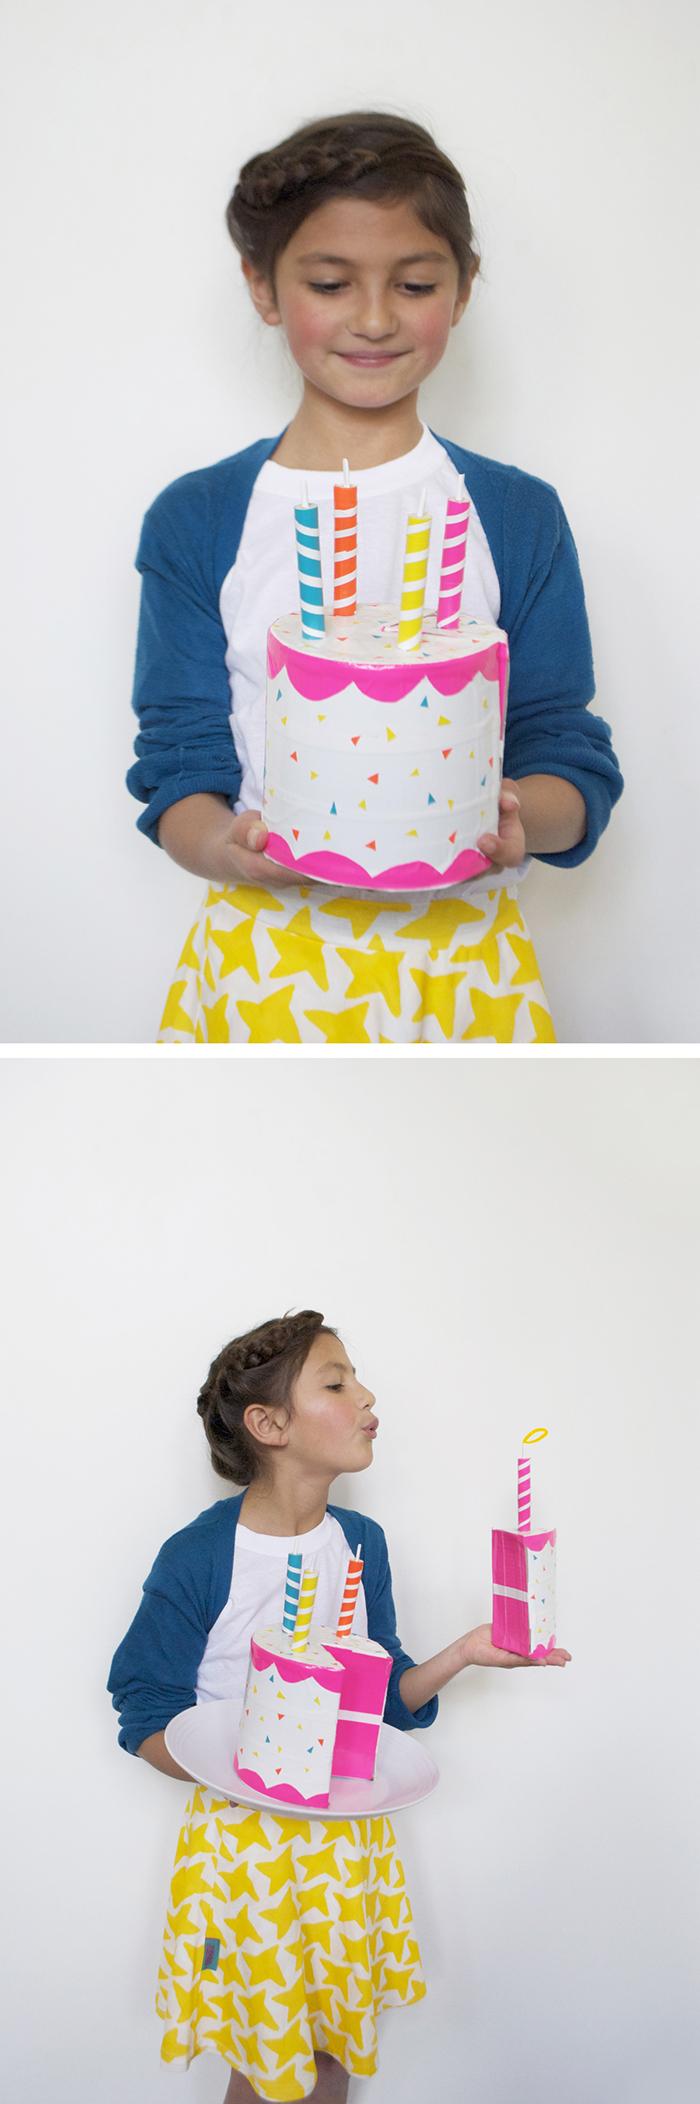 Babiekins Magazine | DIY Play Cake by Mer Mag